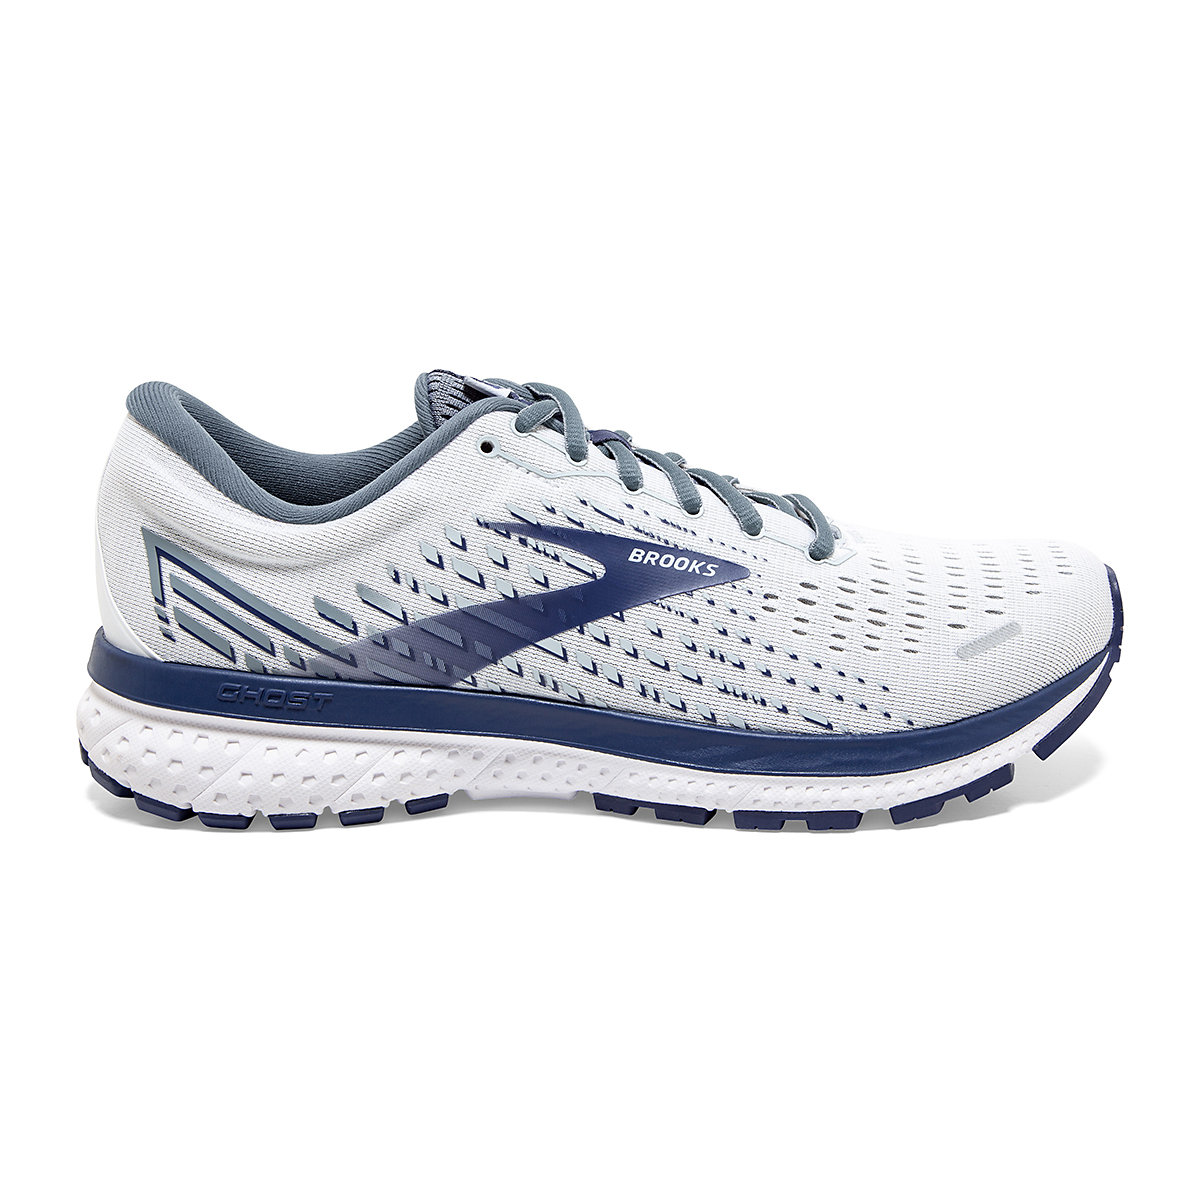 Men's Brooks Ghost 13 Running Shoe - Color: White/Grey/Deep Blue - Size: 7 - Width: Regular, White/Grey/Deep Blue, large, image 1